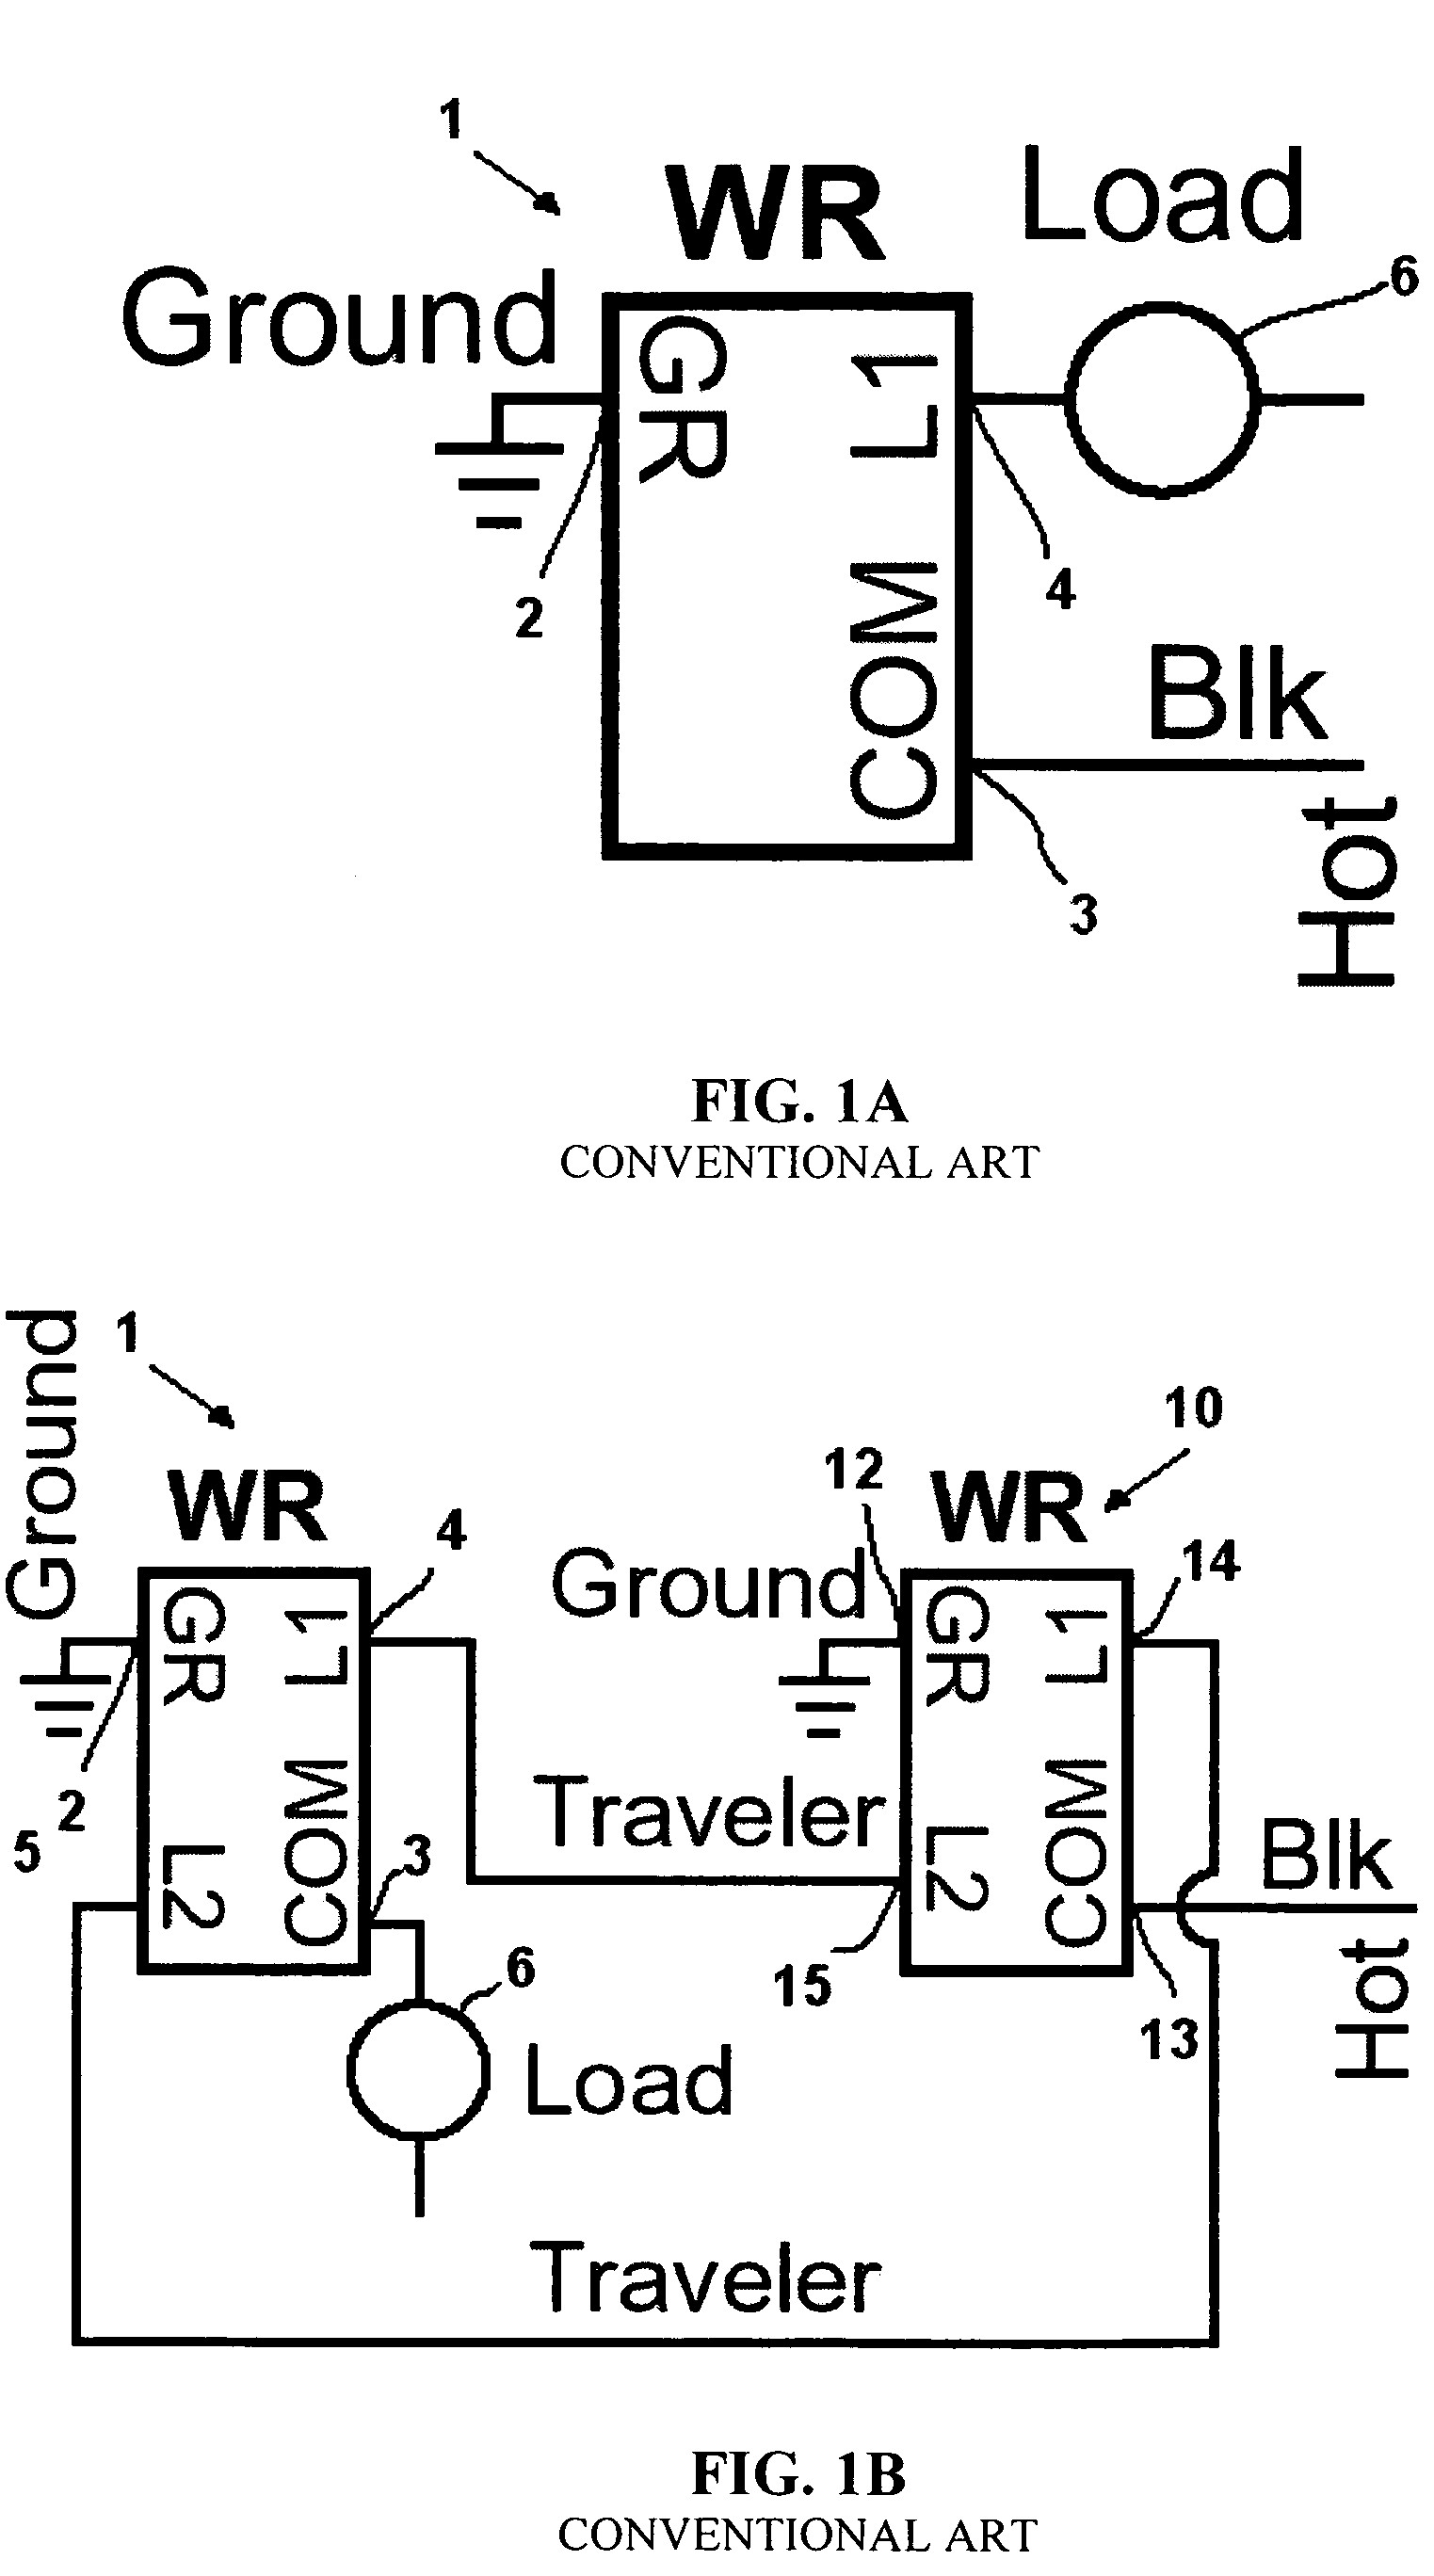 Leviton Decora 3 Way Dimmer Switch Wiring Diagrams Doityourselfhelpcom Diagram Image